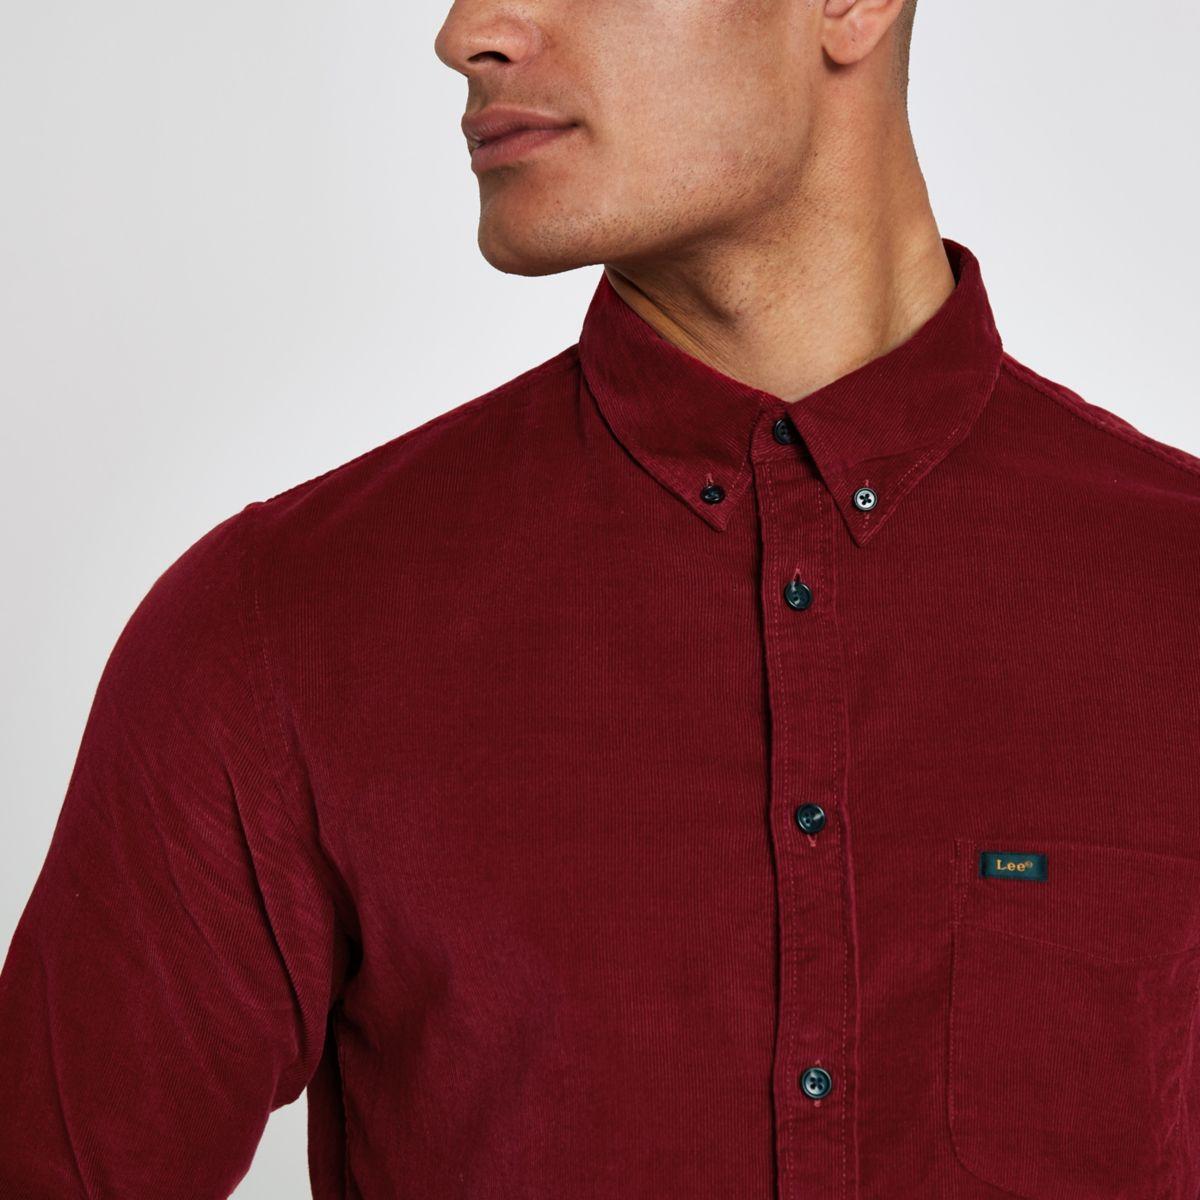 Lee red long sleeve cord shirt